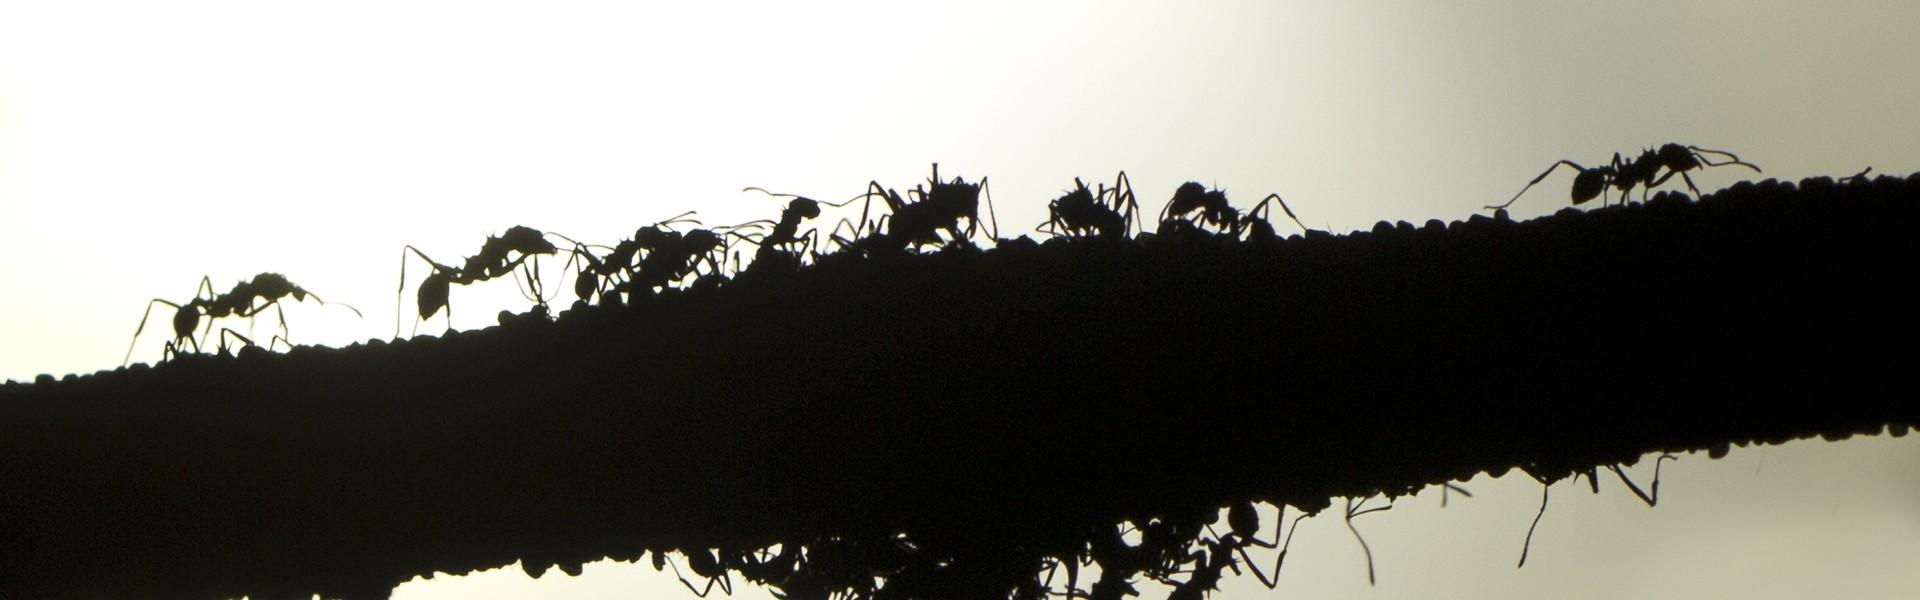 Mieren foto Sami op flicr